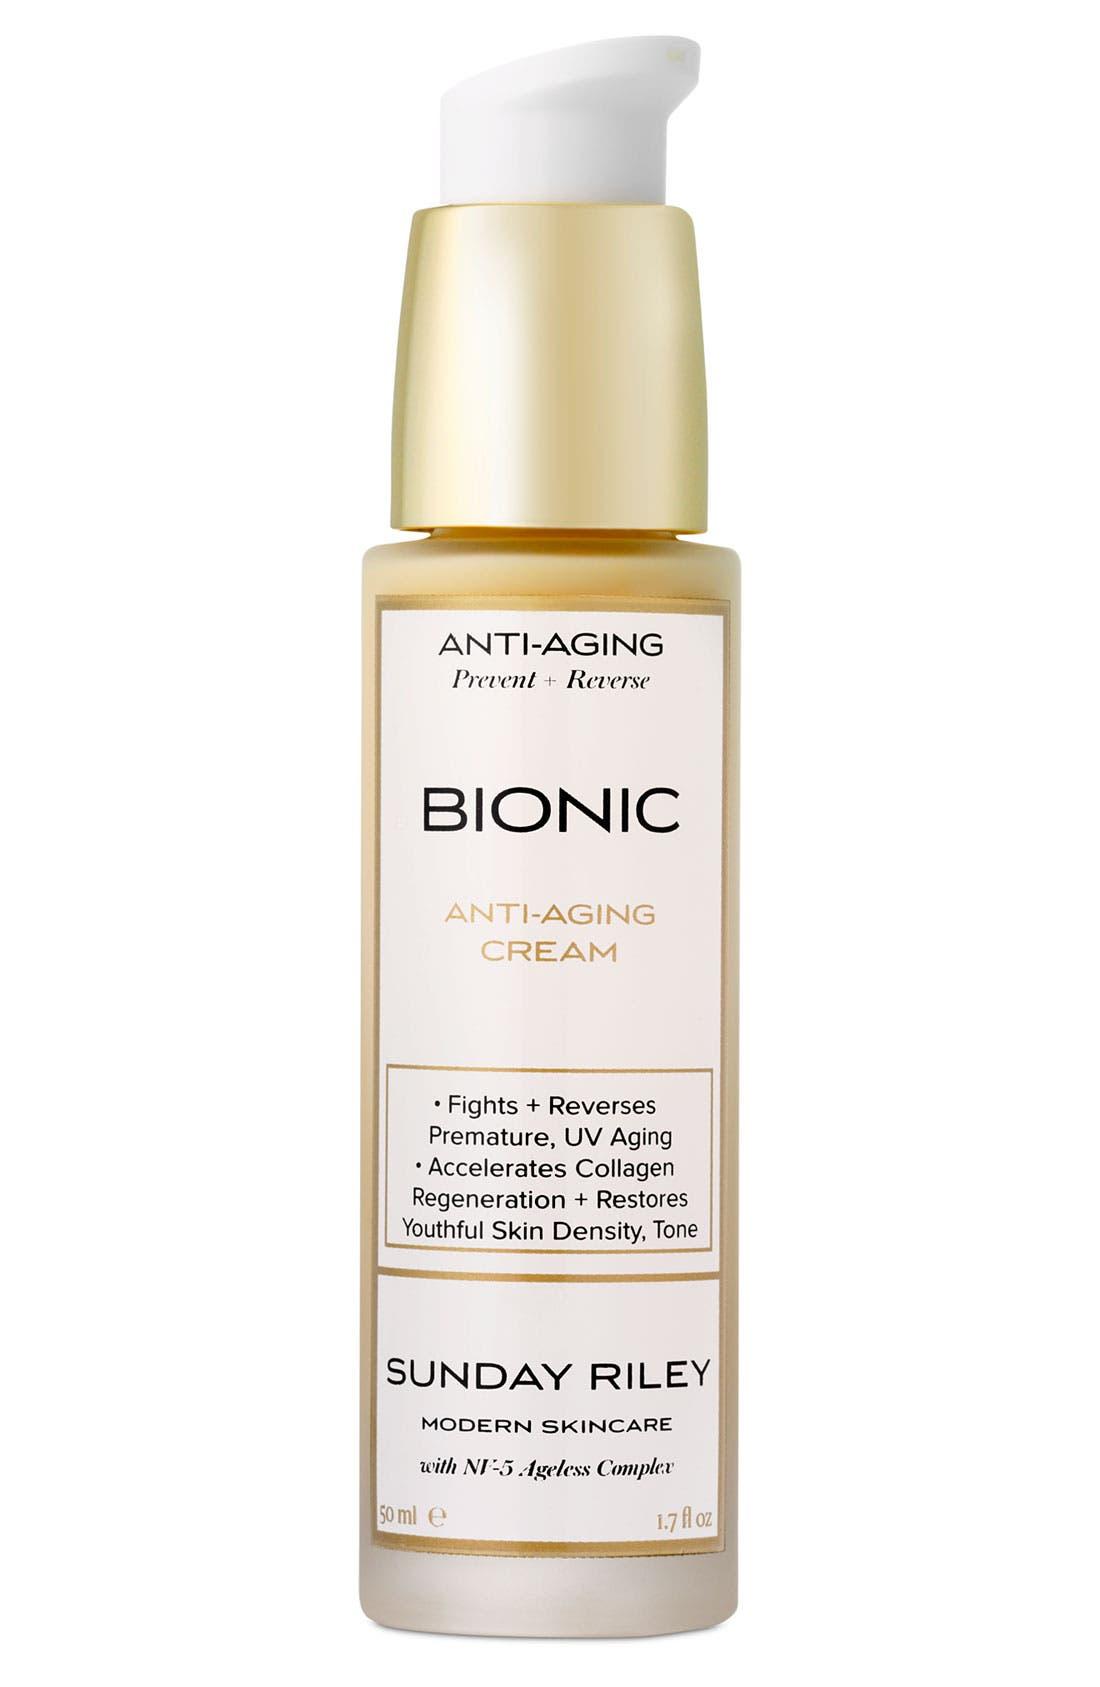 Sunday Riley 'Bionic' Anti-Aging Cream